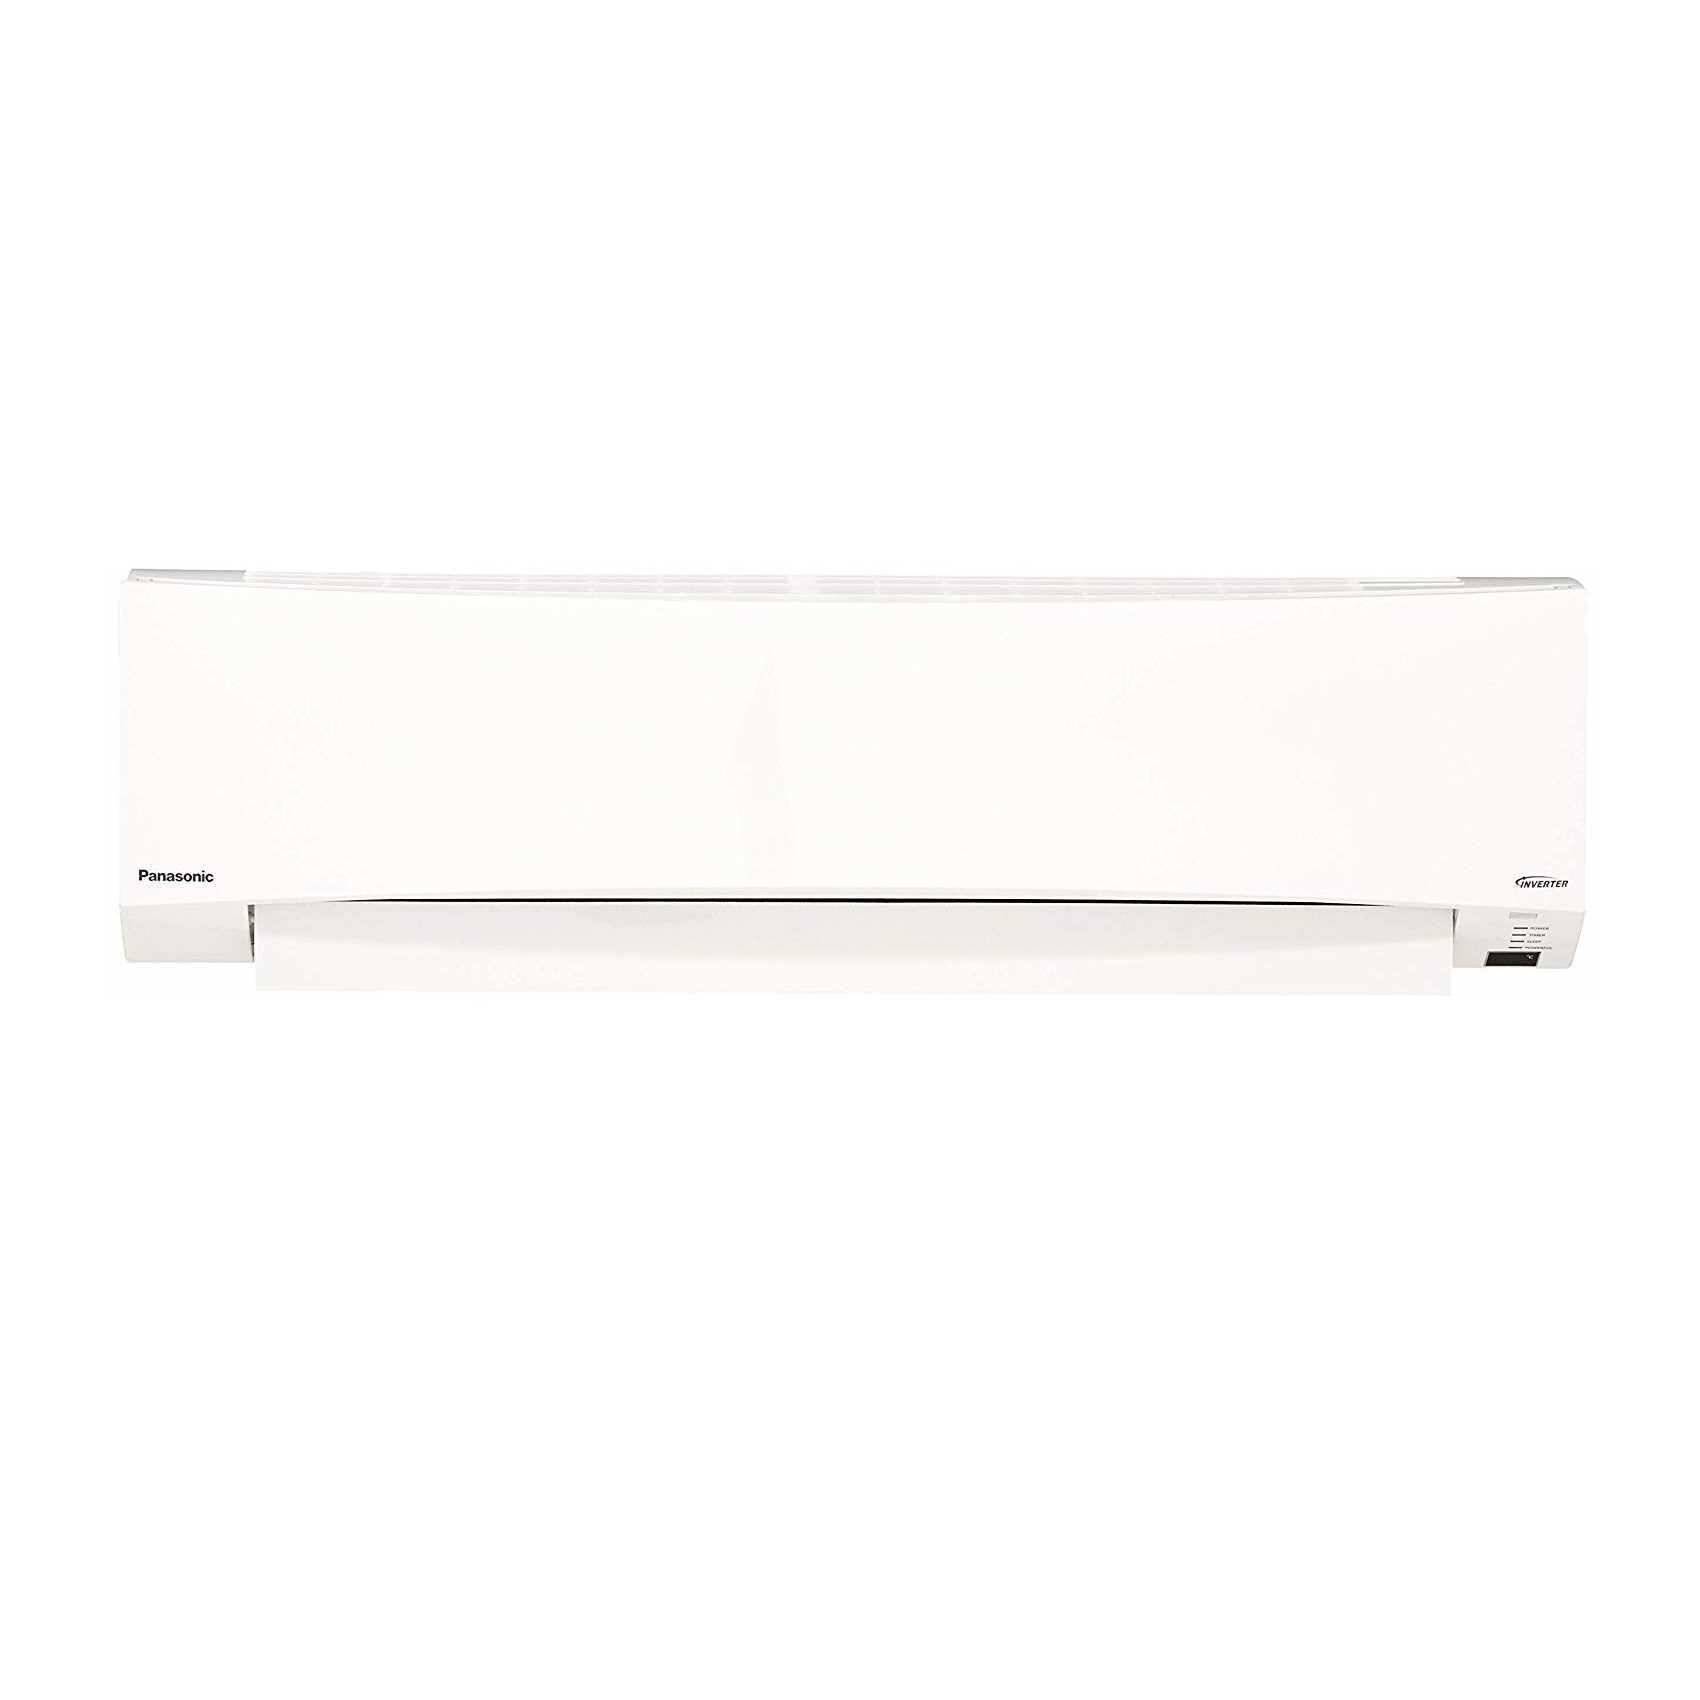 Panasonic CS CU NU12VKYW 1 Ton 5 Star Inverter Split AC